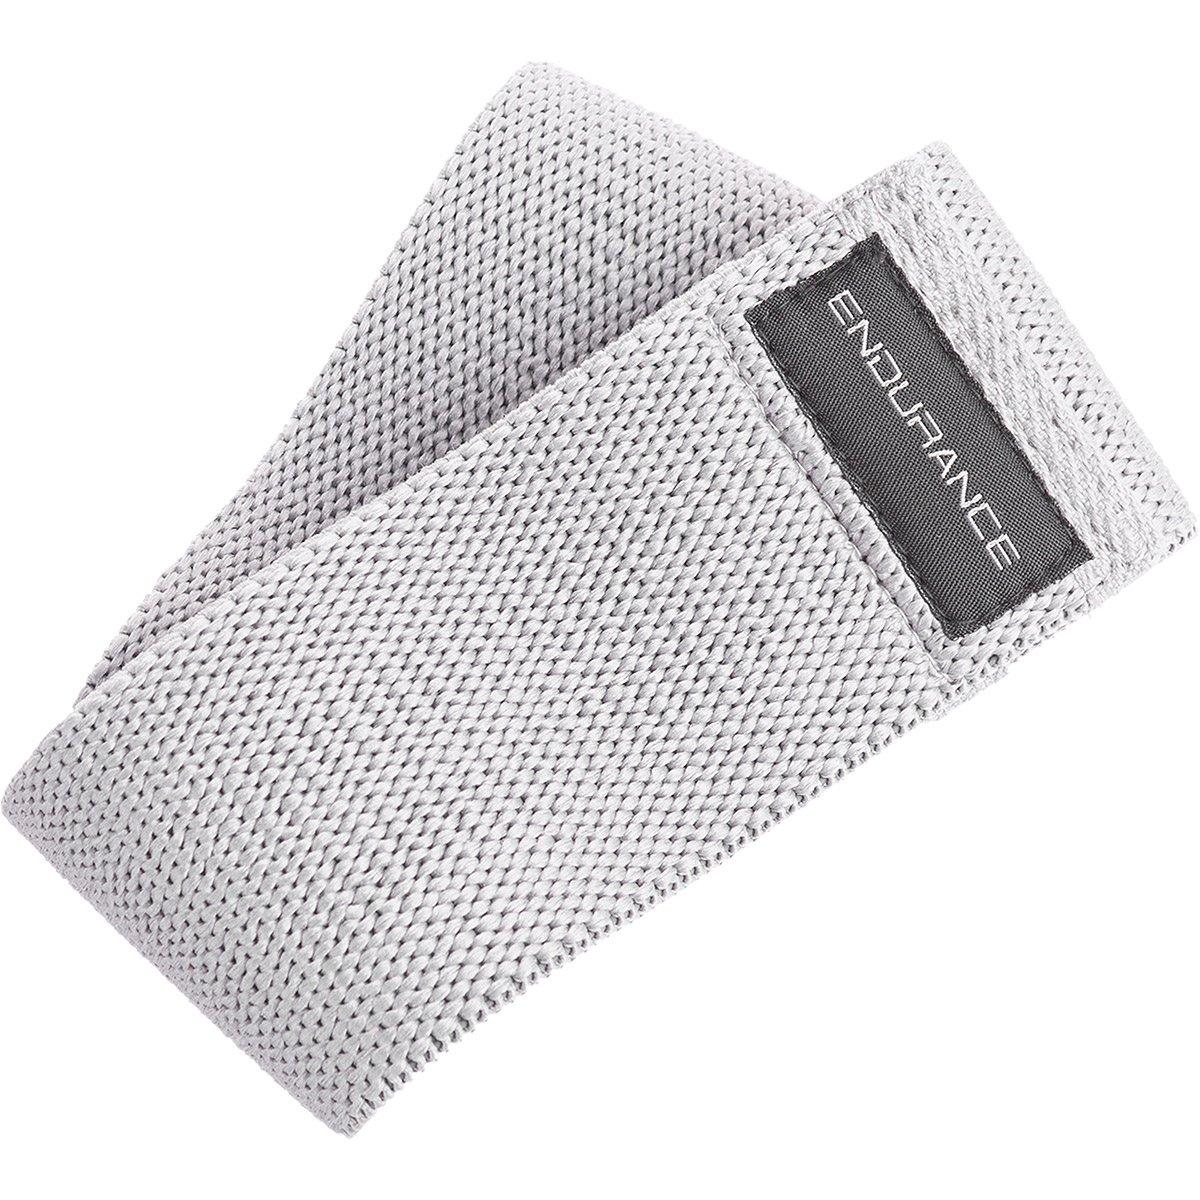 Køb Endurance Tekstil Power Band – Medium